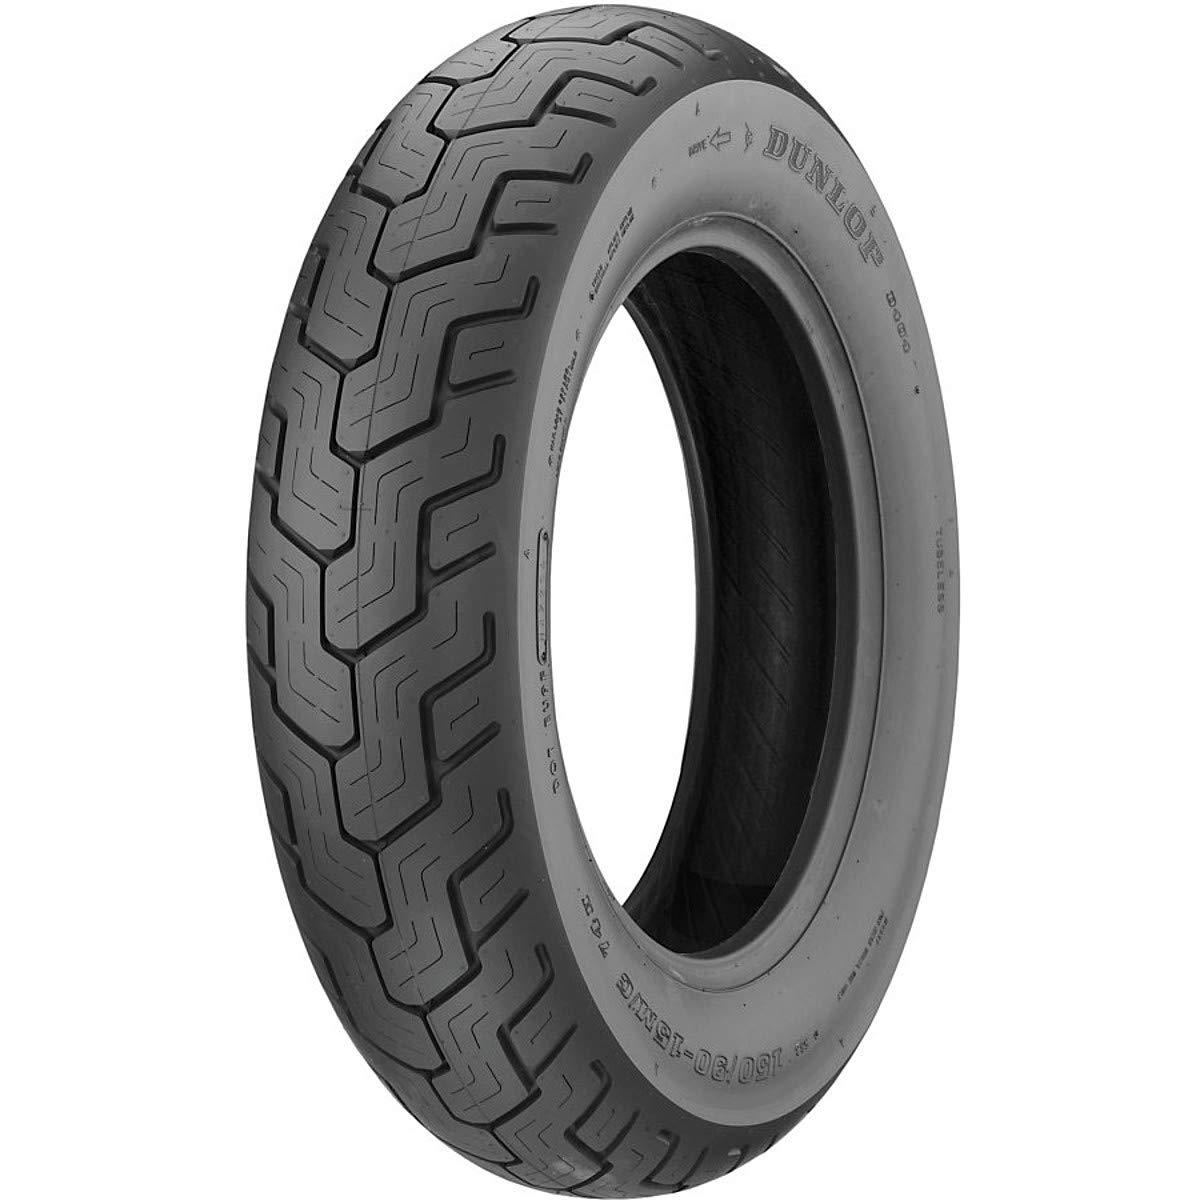 Dunlop D404 Rear Motorcycle Tire 170/80-15 (77H) Black Wall